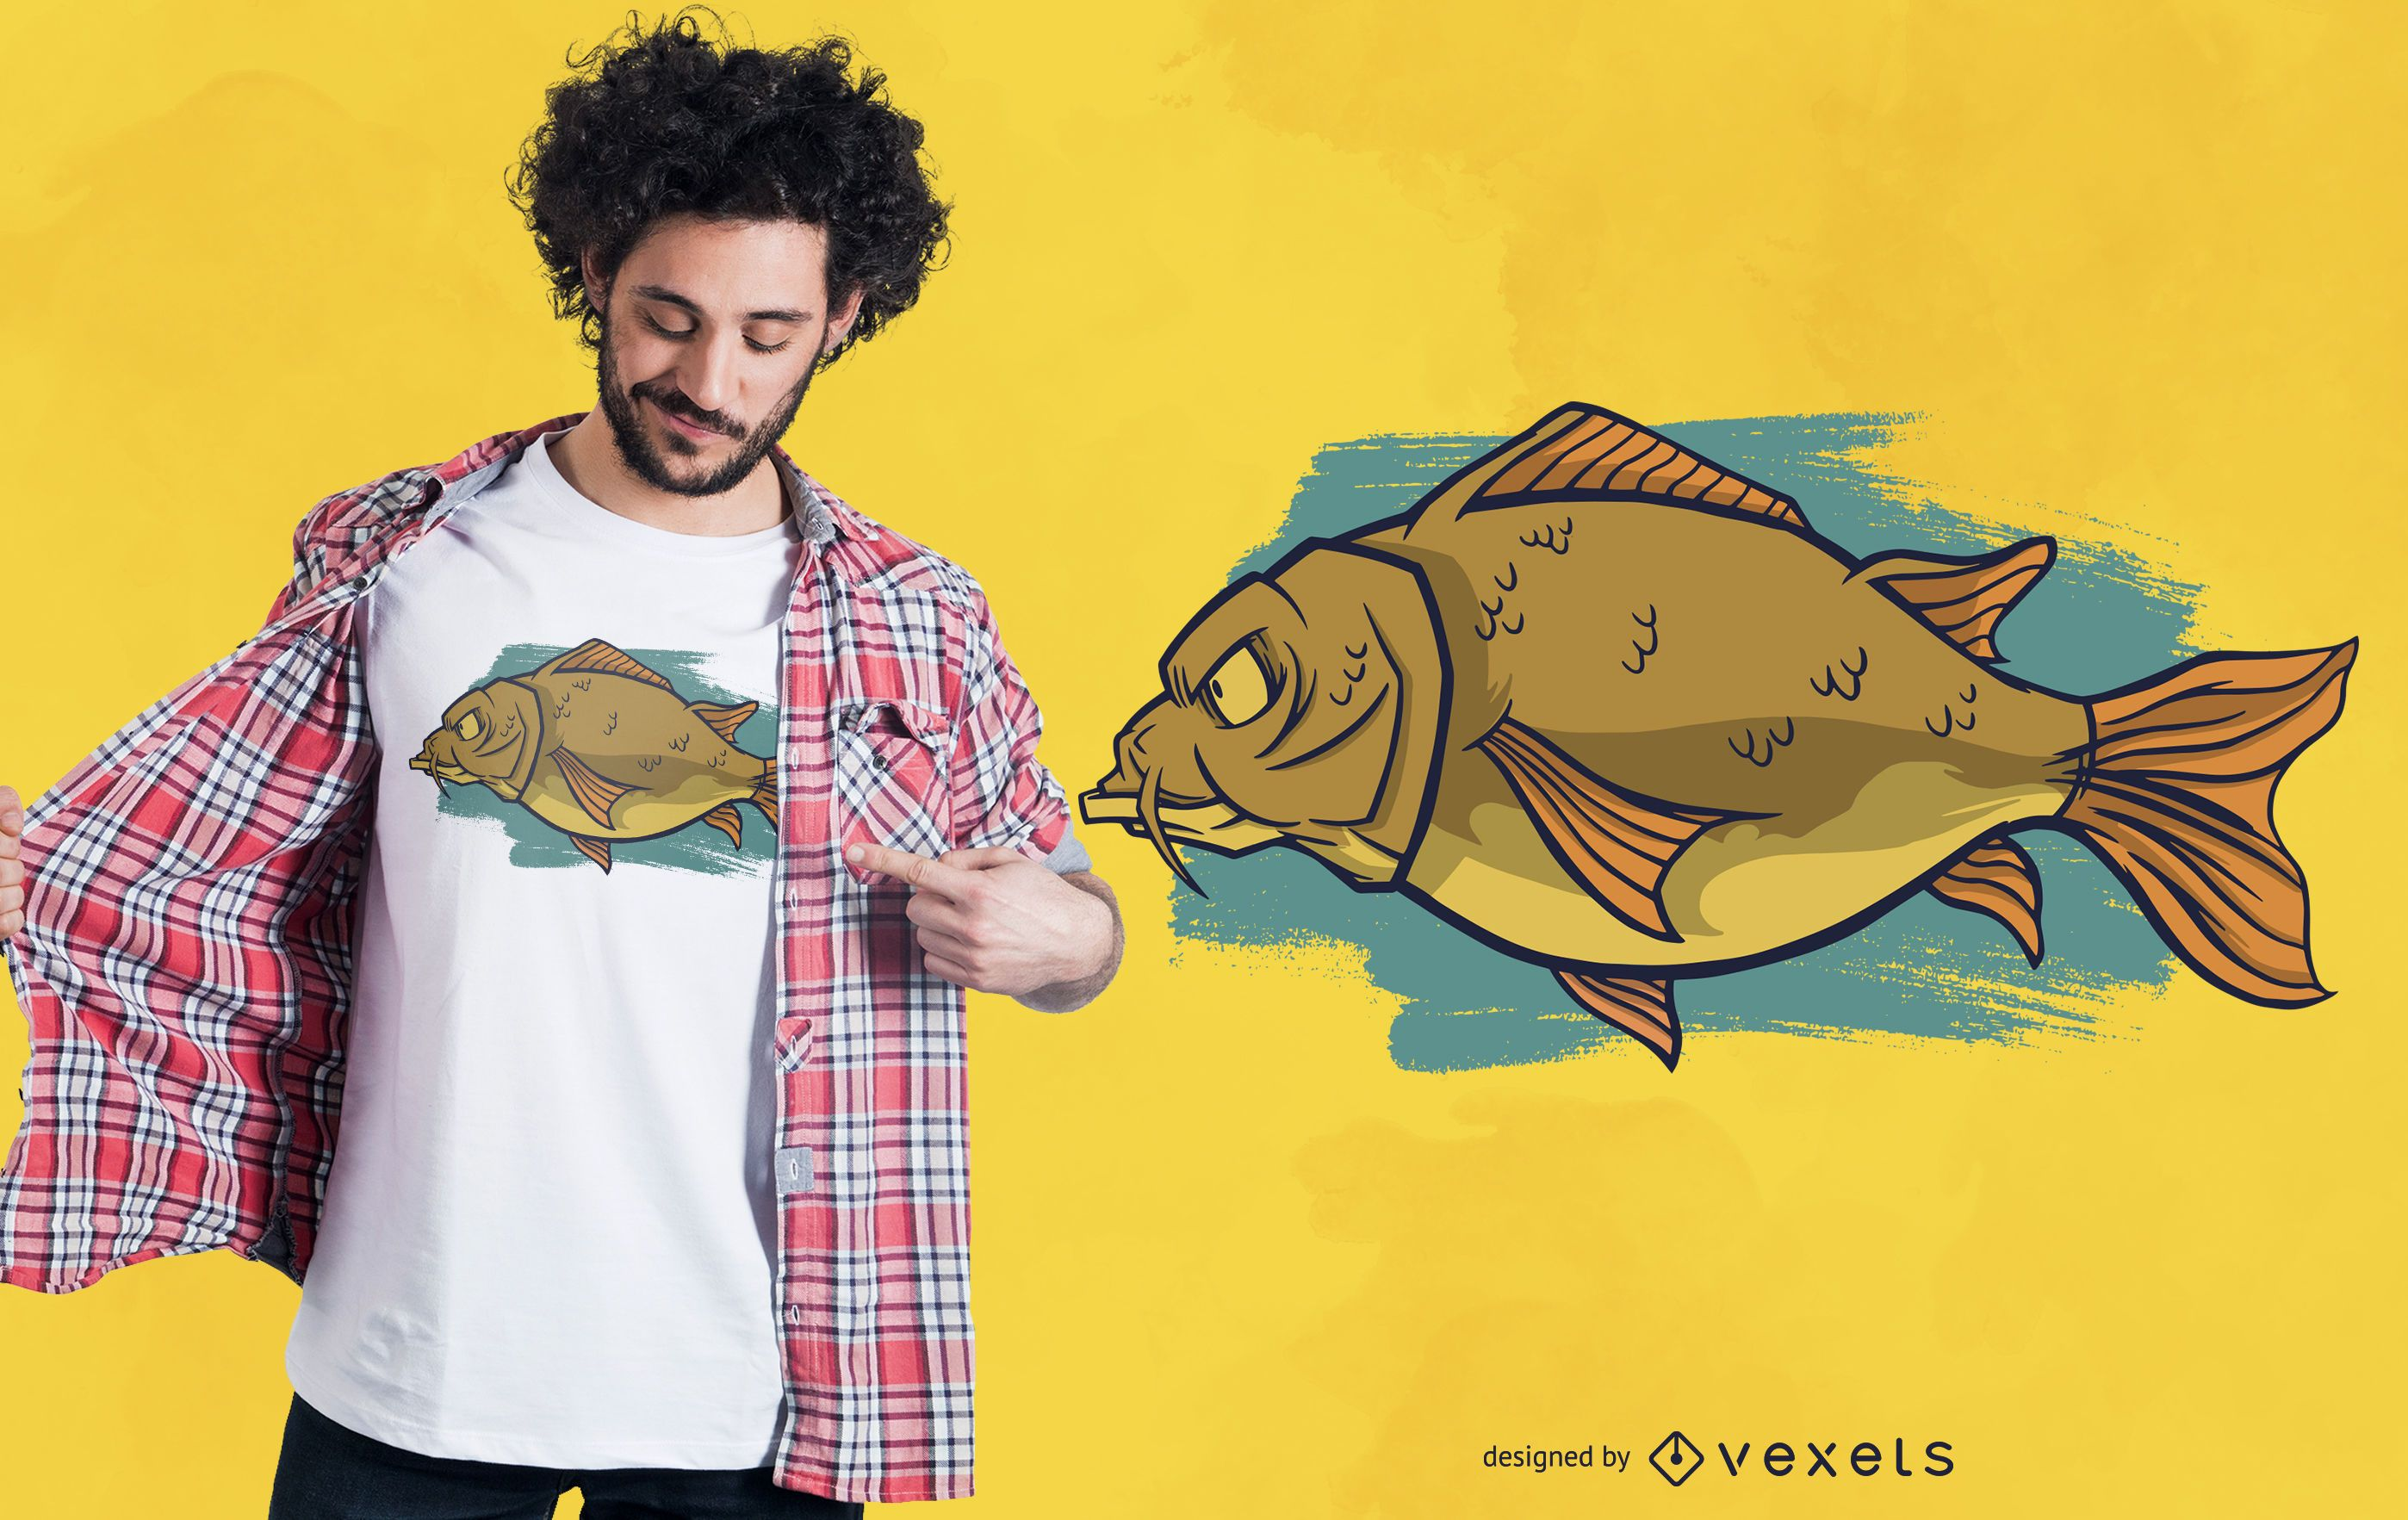 Big Carp T-shirt Design